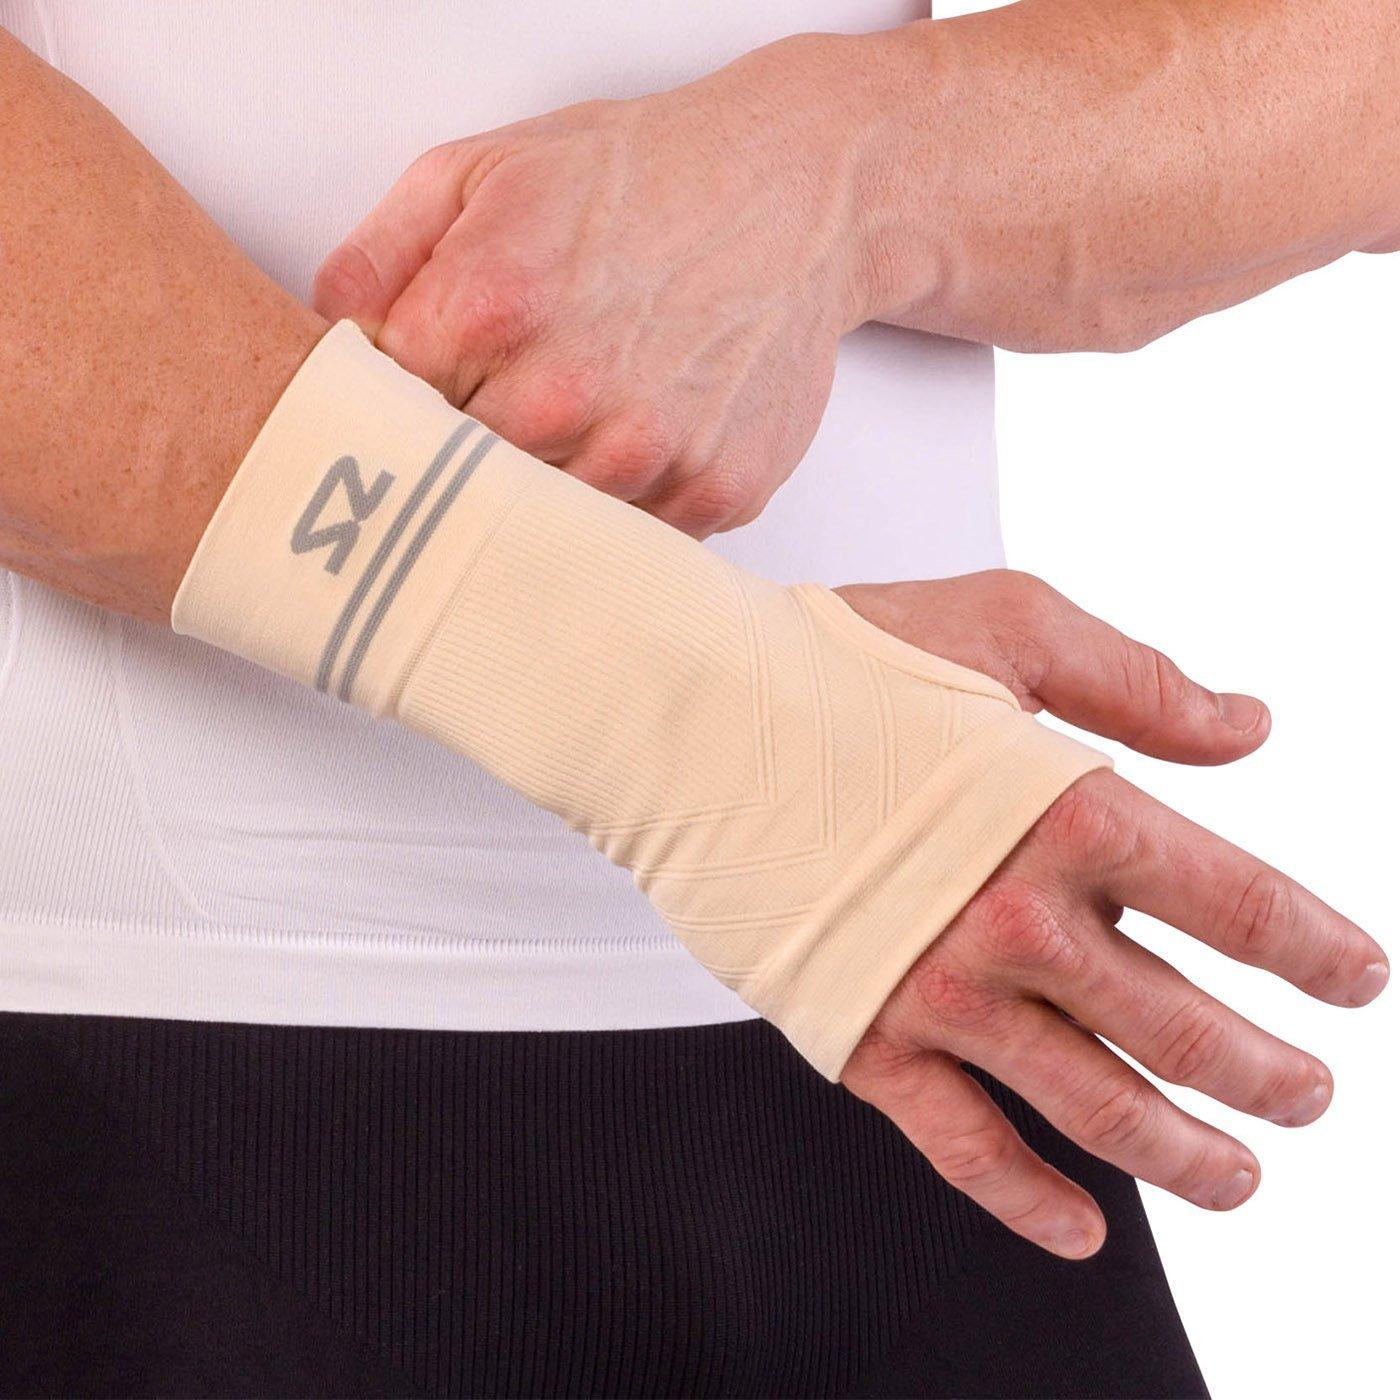 749fbcb330 Zensah Compression Wrist Support - Wrist Sleeve for Wrist Pain, Carpal  Tunnel - Wrist Support - Wrist Brace